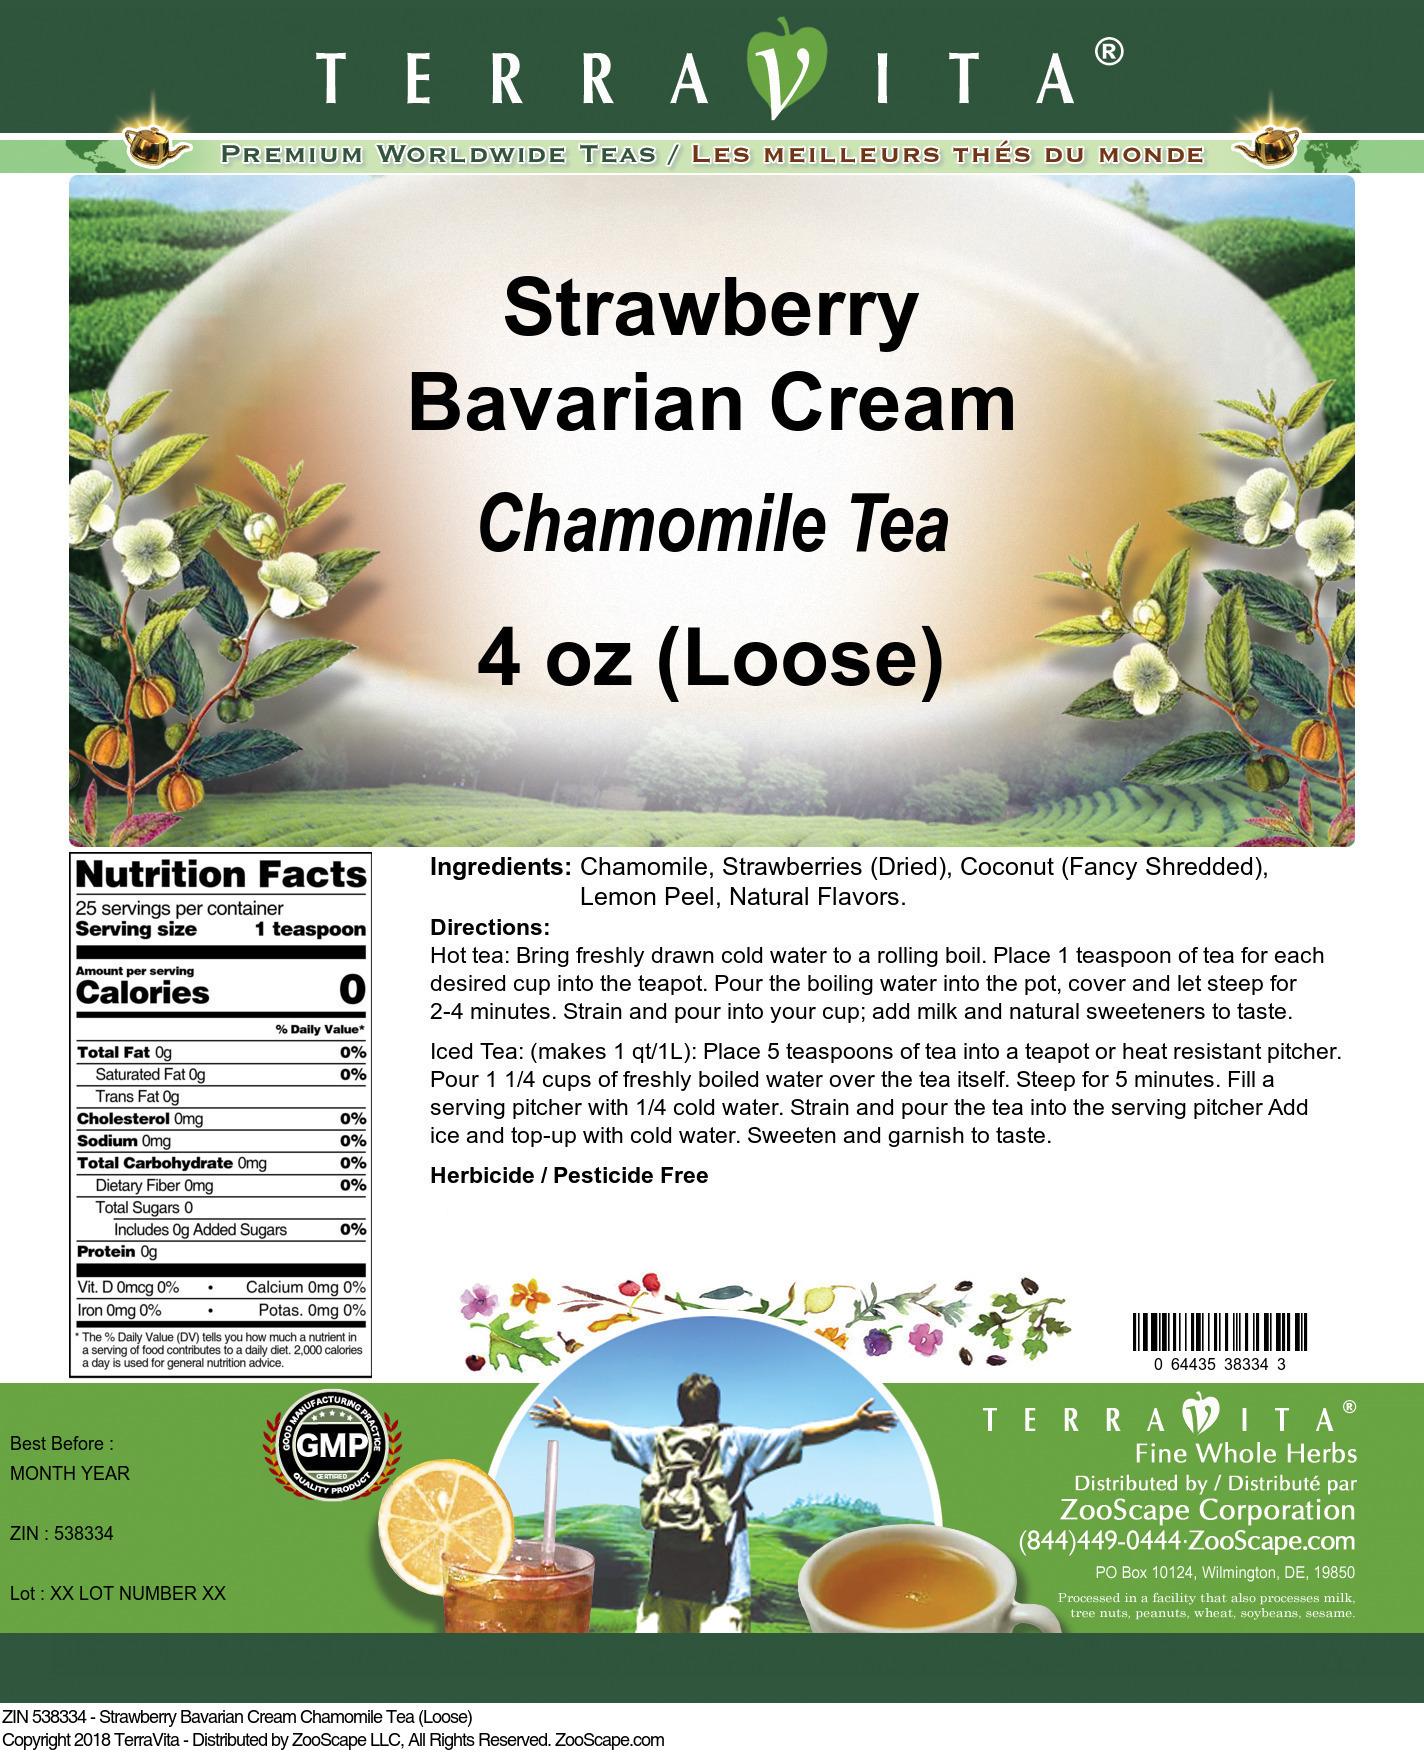 Strawberry Bavarian Cream Chamomile Tea (Loose)